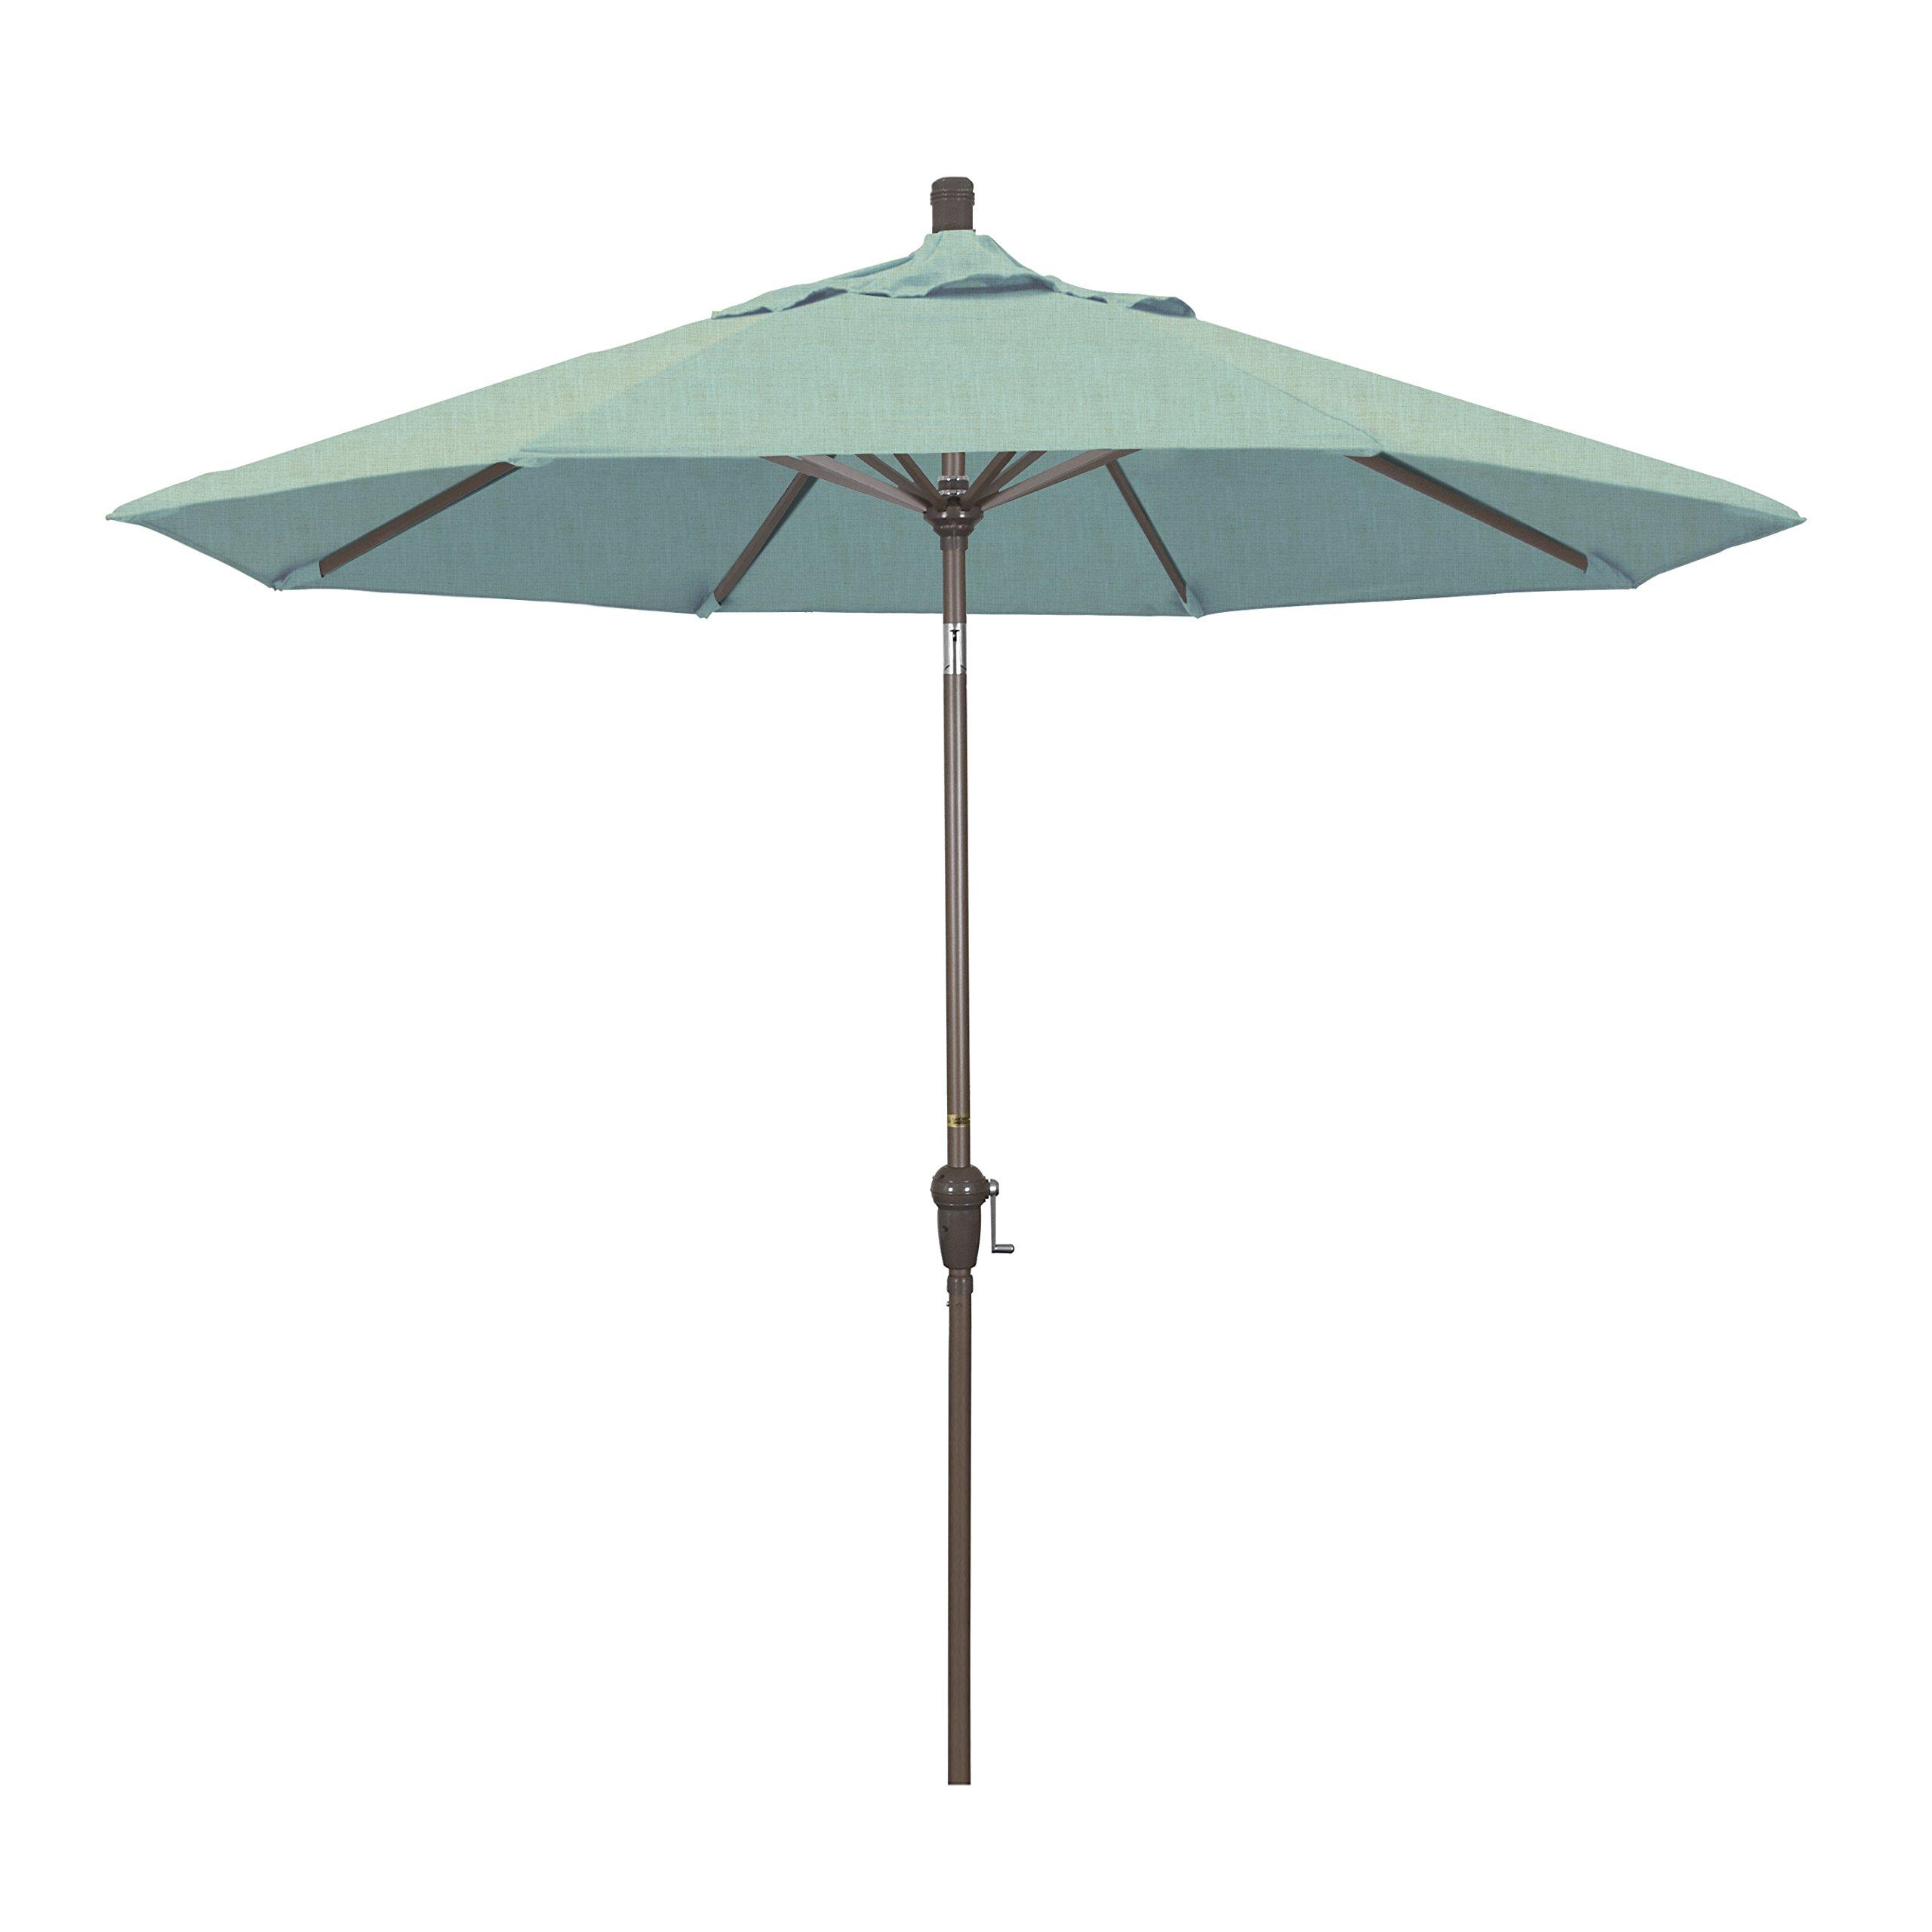 California Umbrella 9' Round Aluminum Market Umbrella, Crank Lift, Auto Tilt, Champagne Pole, Sunbrella Spa